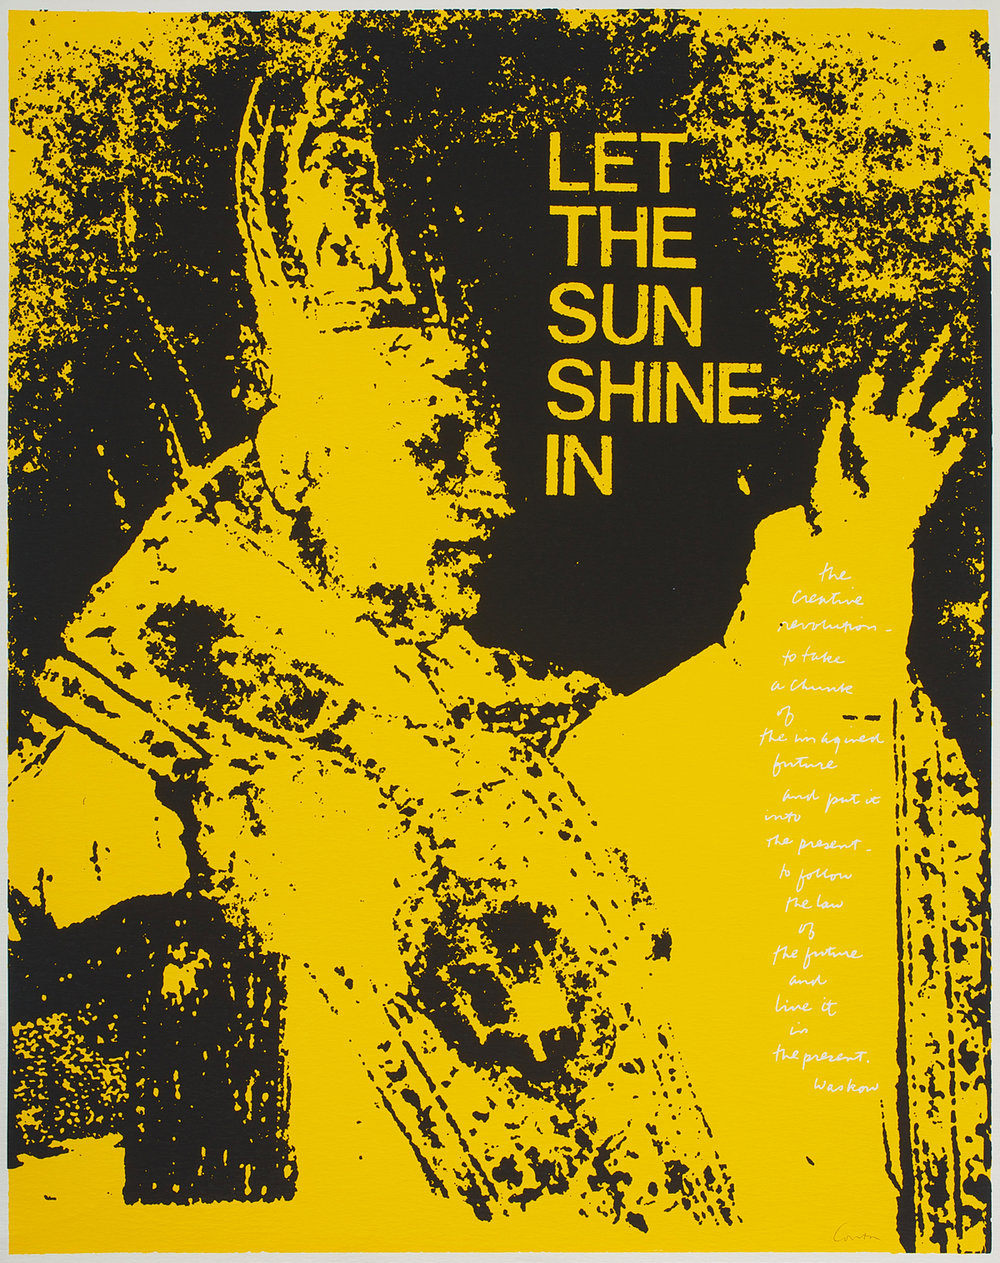 let the sun shine (1968)